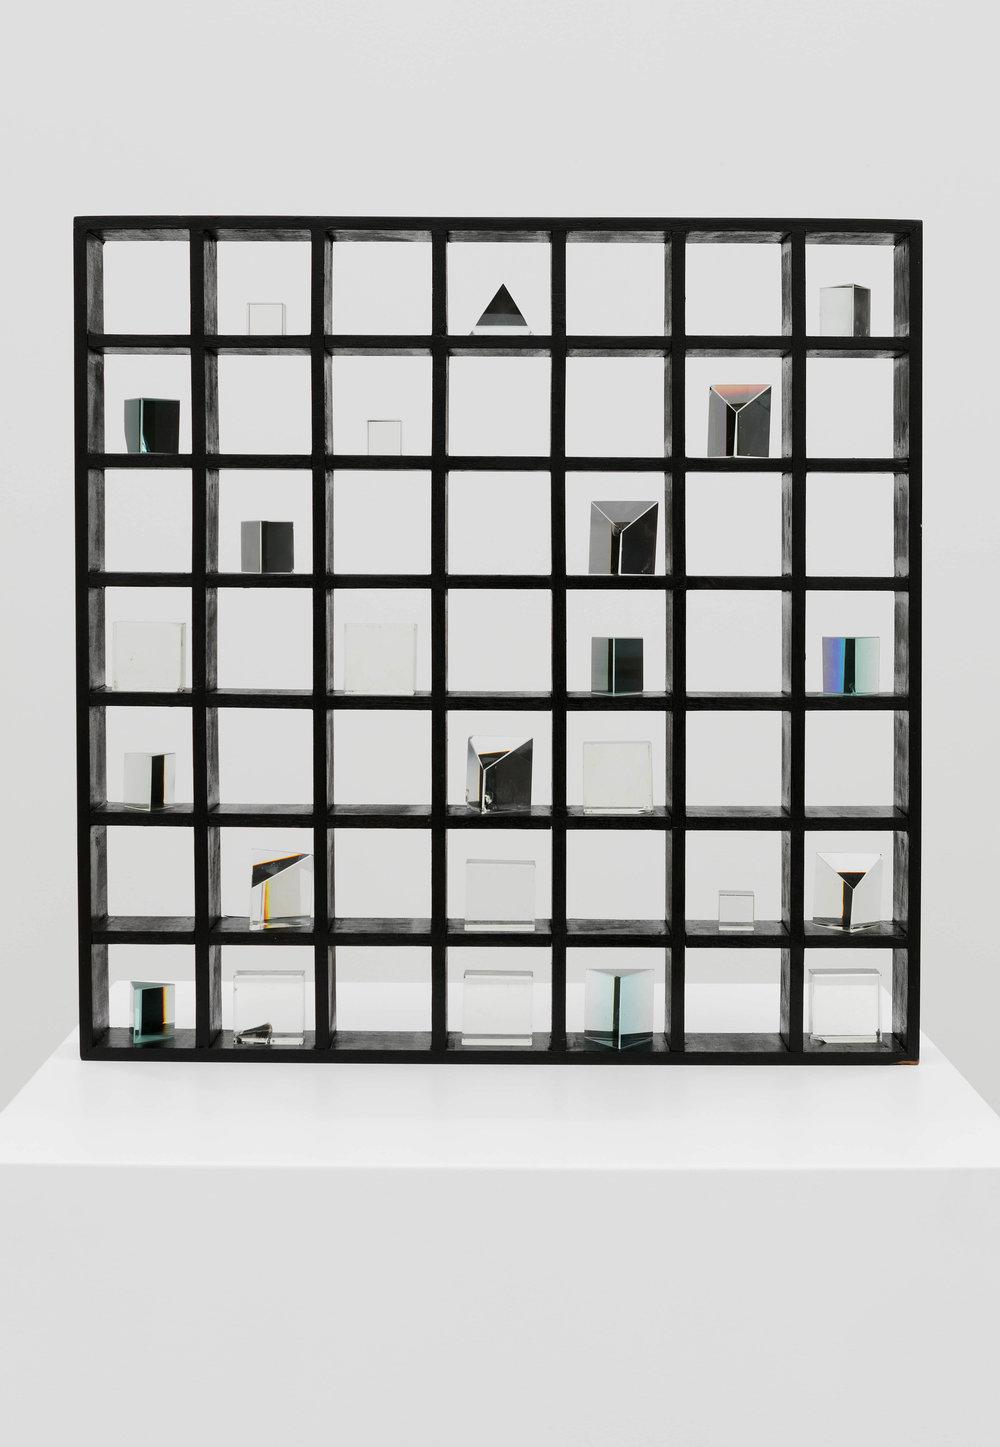 Untitled, wooden grid shelf with prisms 62 x 62 x .6cm, 1983. Courtesy of Nurjahan Akhlaq. Photography Asif Khan & Richard Seck.